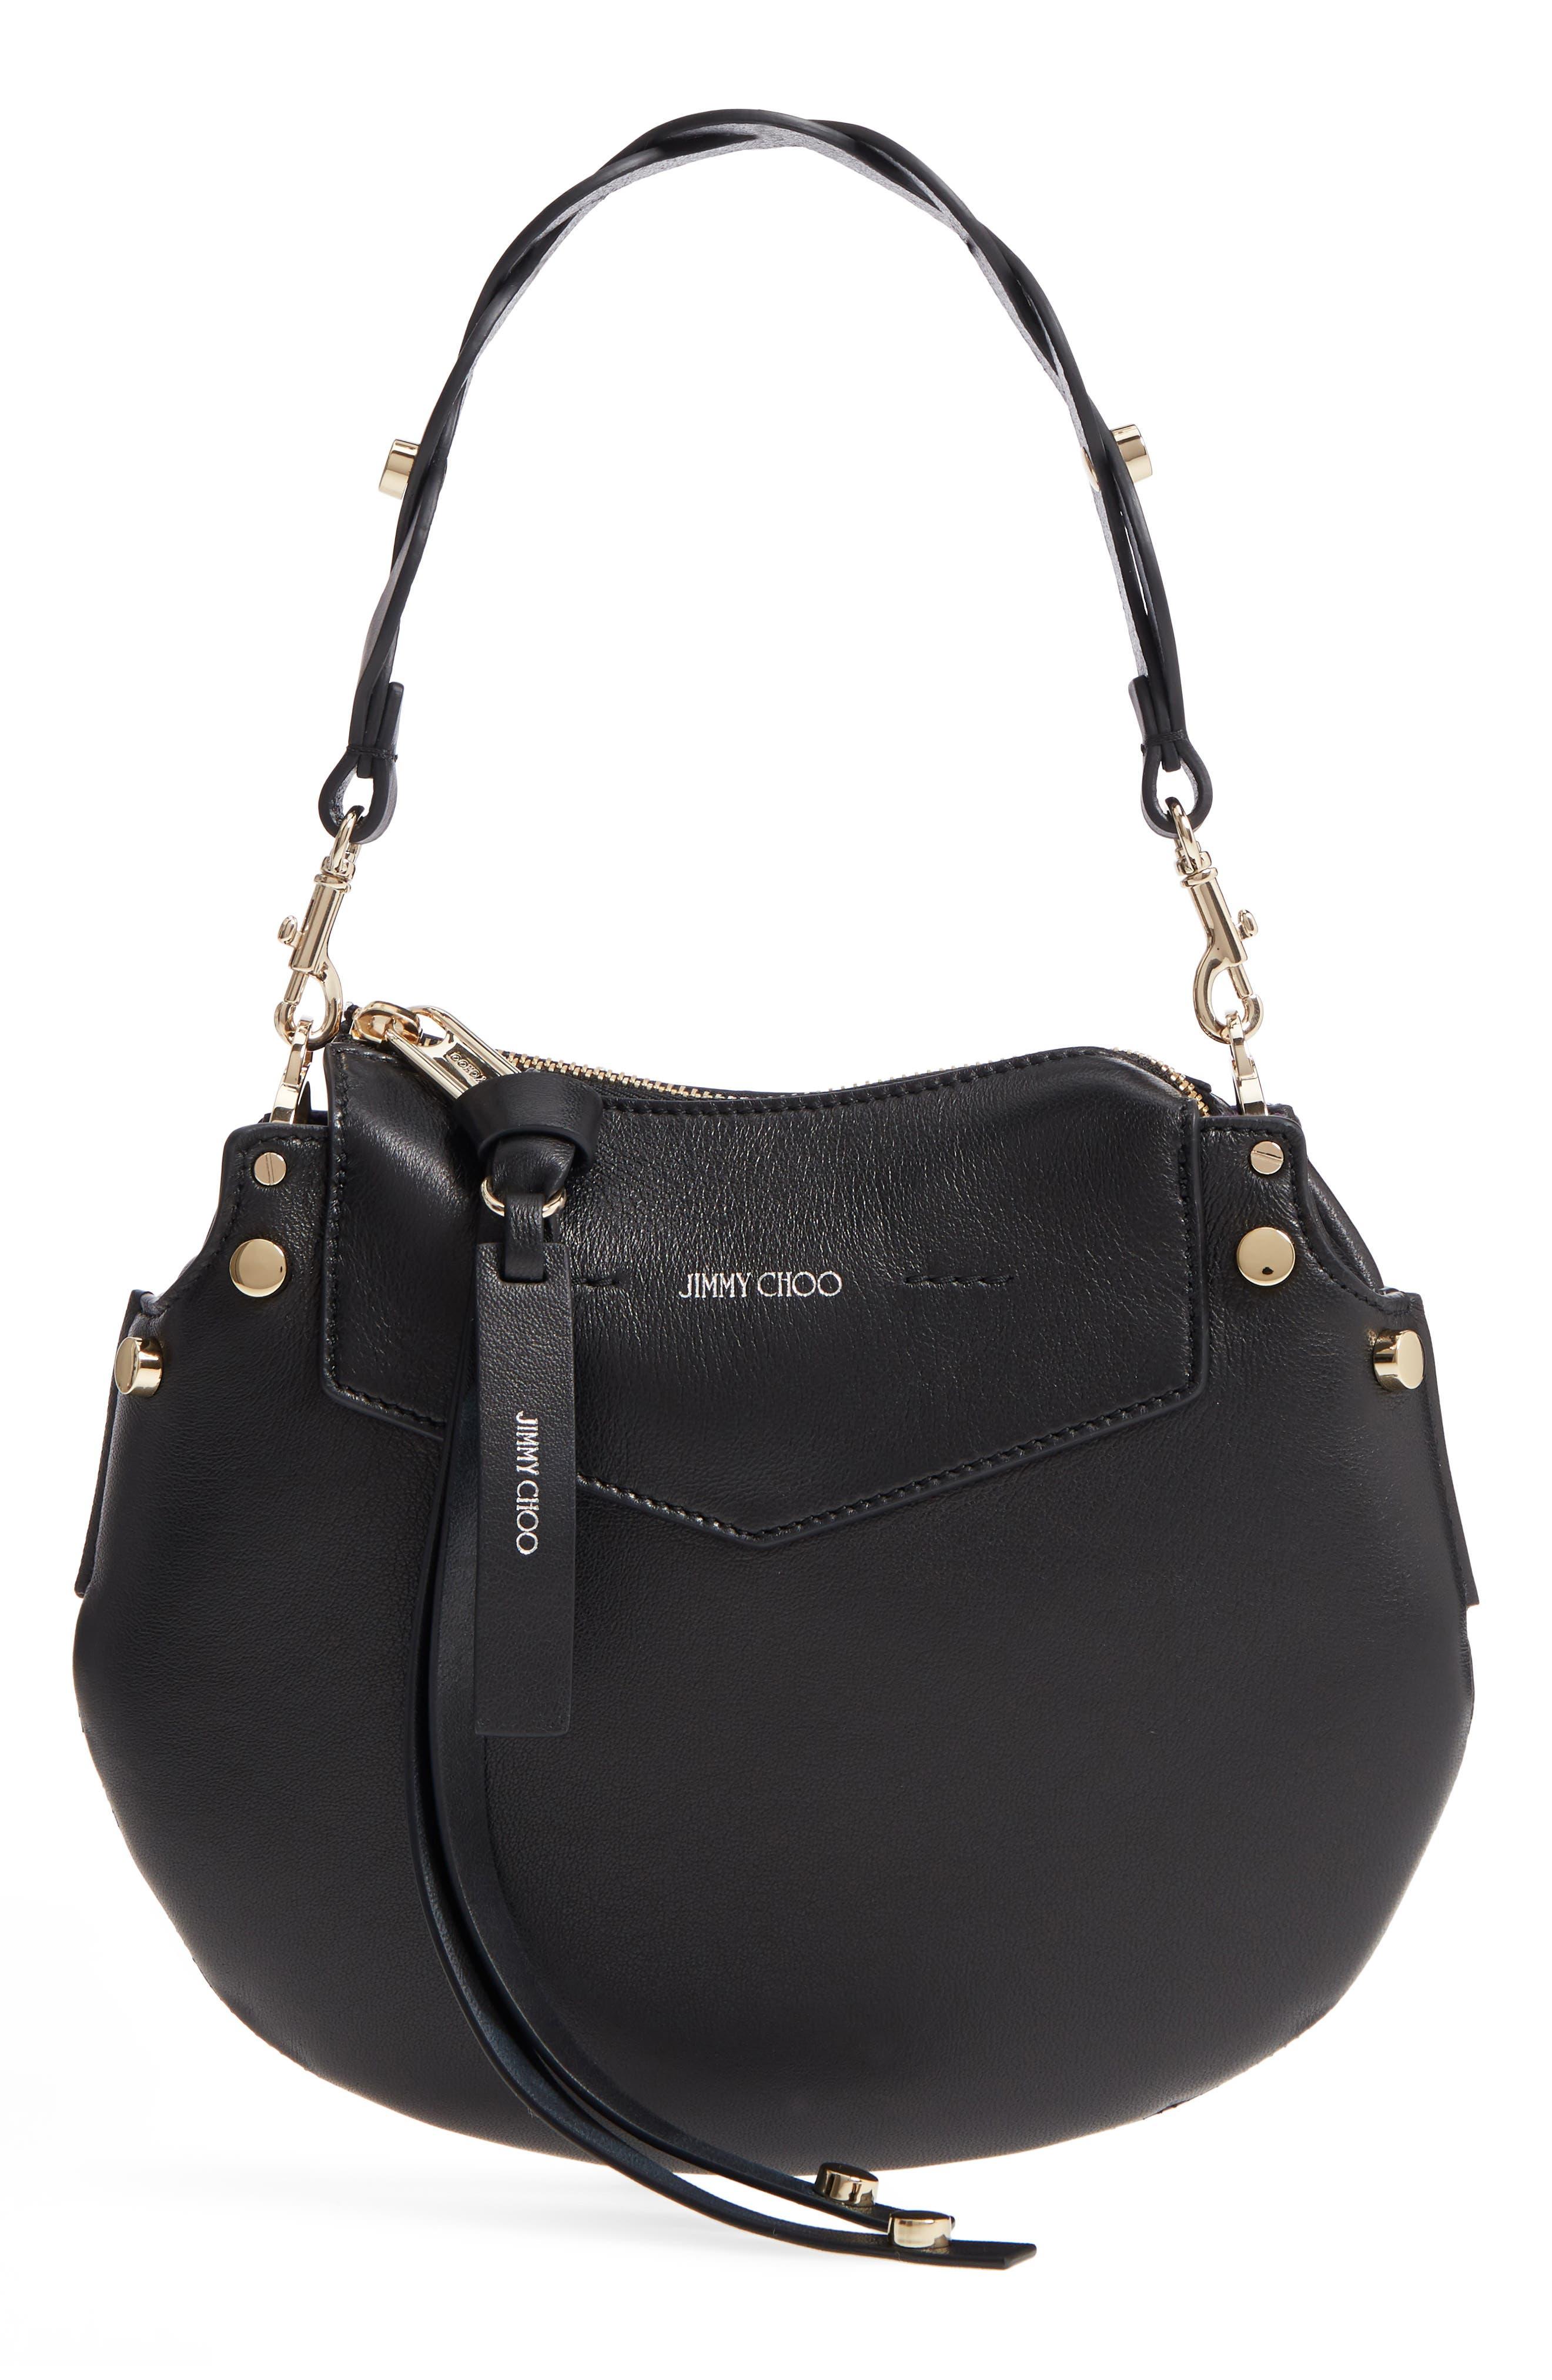 Jimmy Choo Mini Artie Leather Crossbody Bag